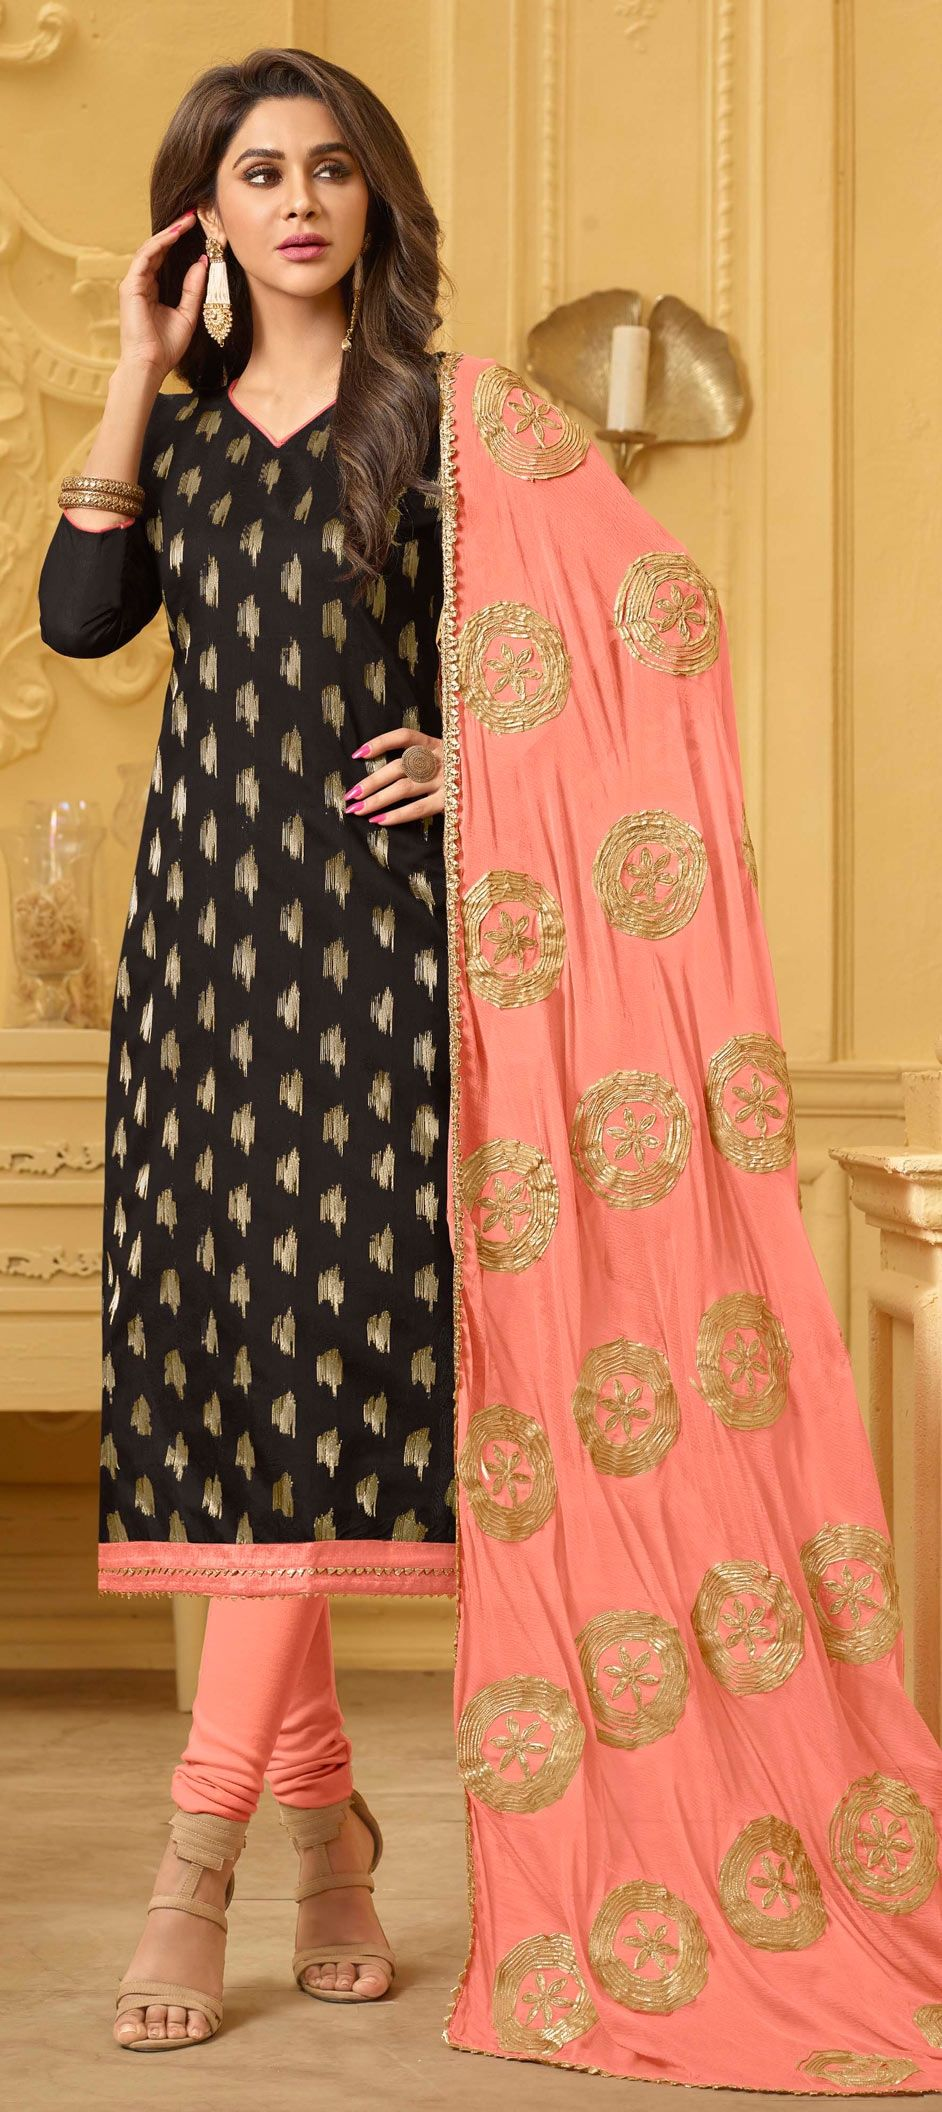 2bc4a39ba7 1559171: Casual, Party Wear Black and Grey color Banarasi Silk ...